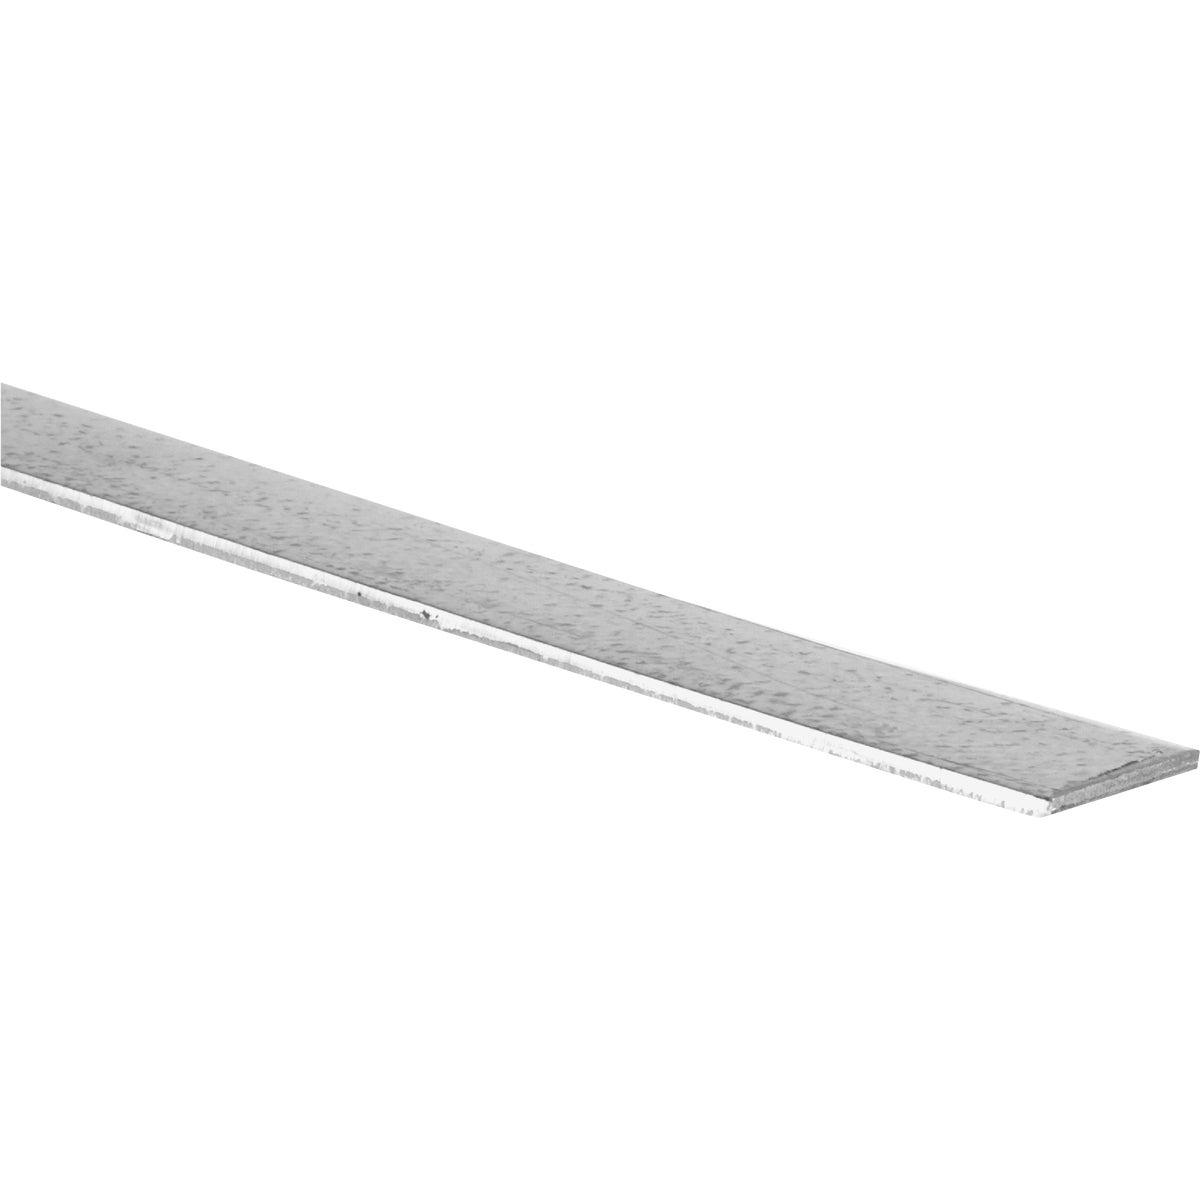 National Mfg. 1-1/4X4' STL FLAT PLATE N180059